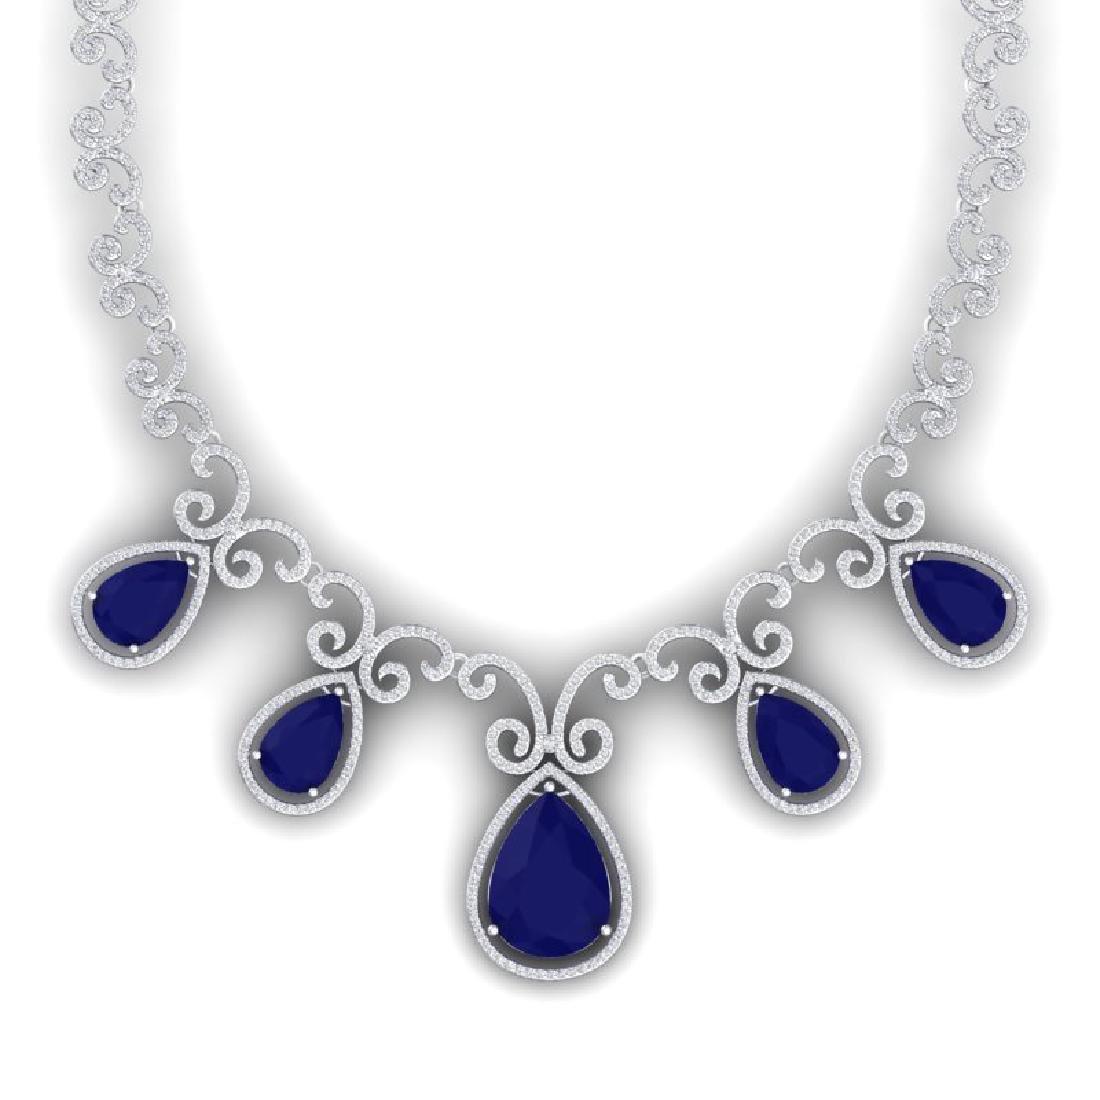 38.42 CTW Royalty Sapphire & VS Diamond Necklace 18K